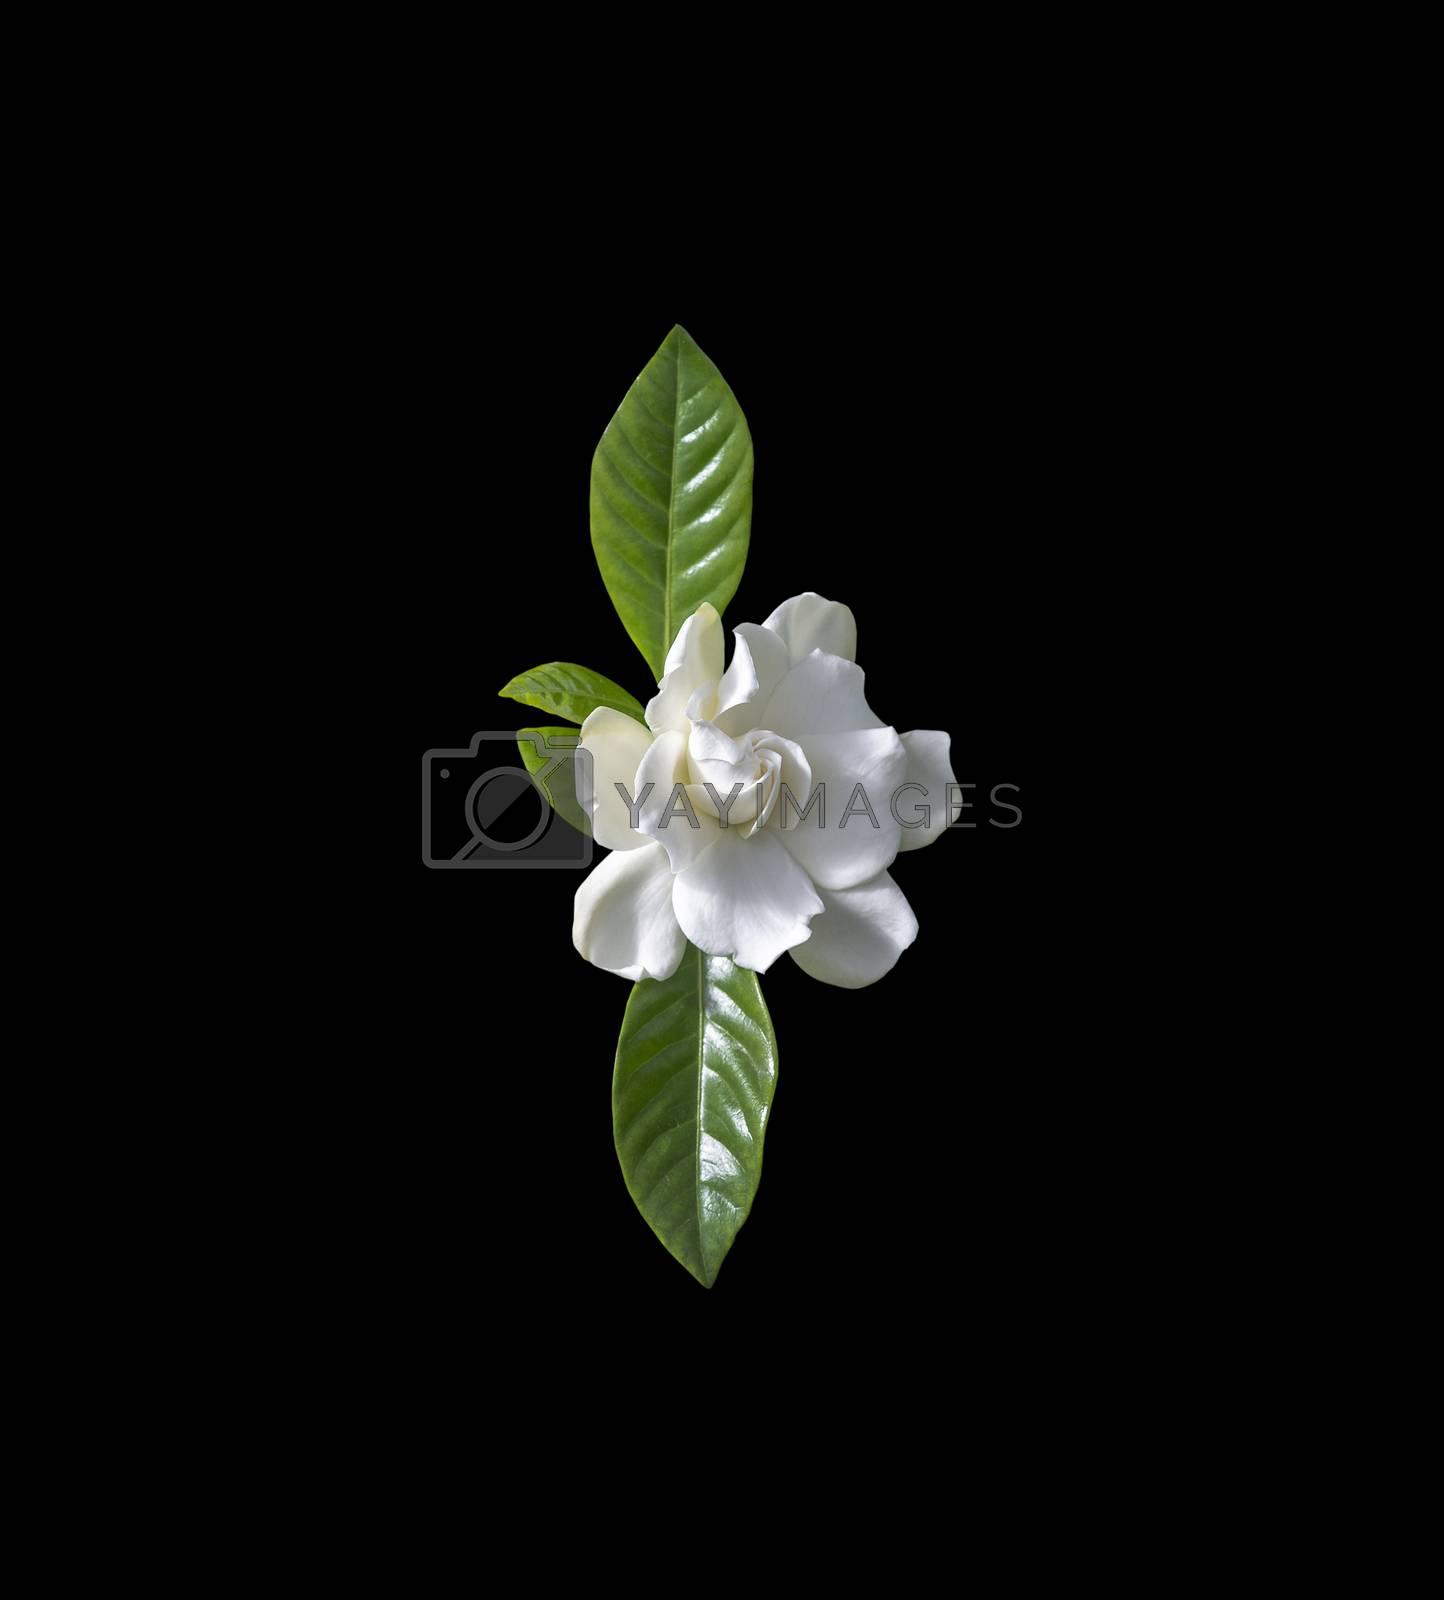 Beautiful white gardenia flower closeup by Artesia Wells